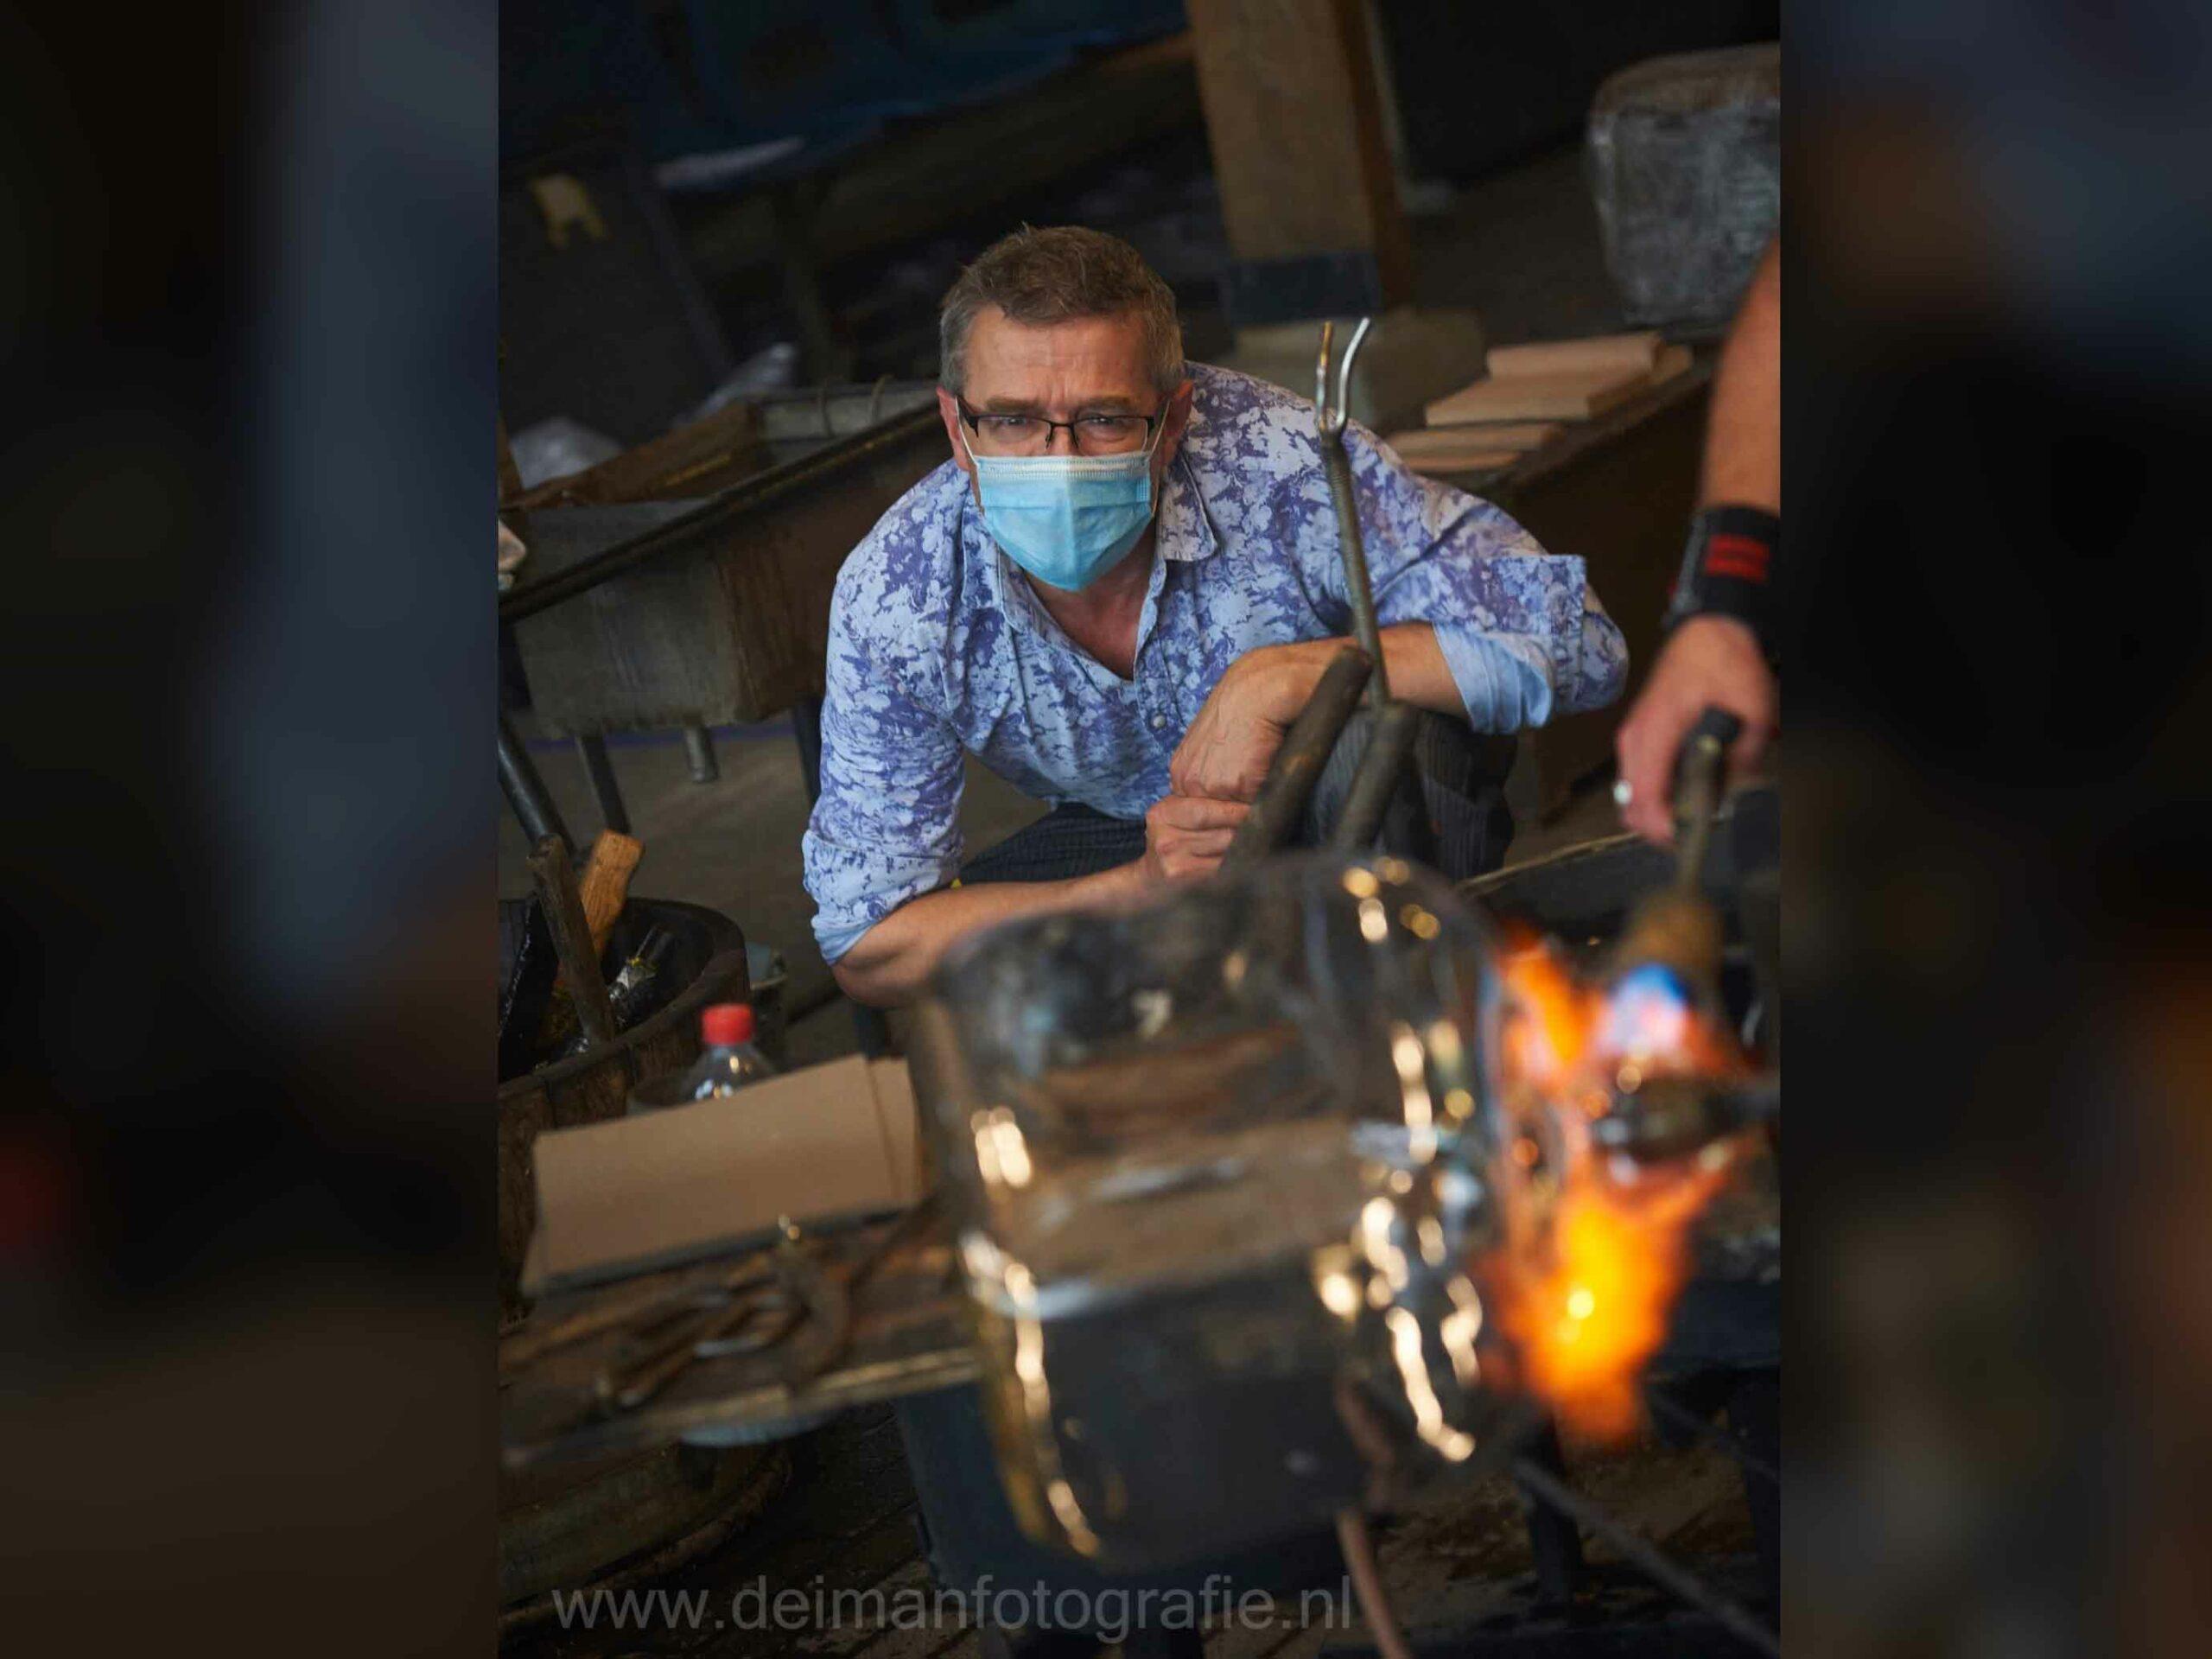 Preparing Glass Sculptures 'Dark Cameras'